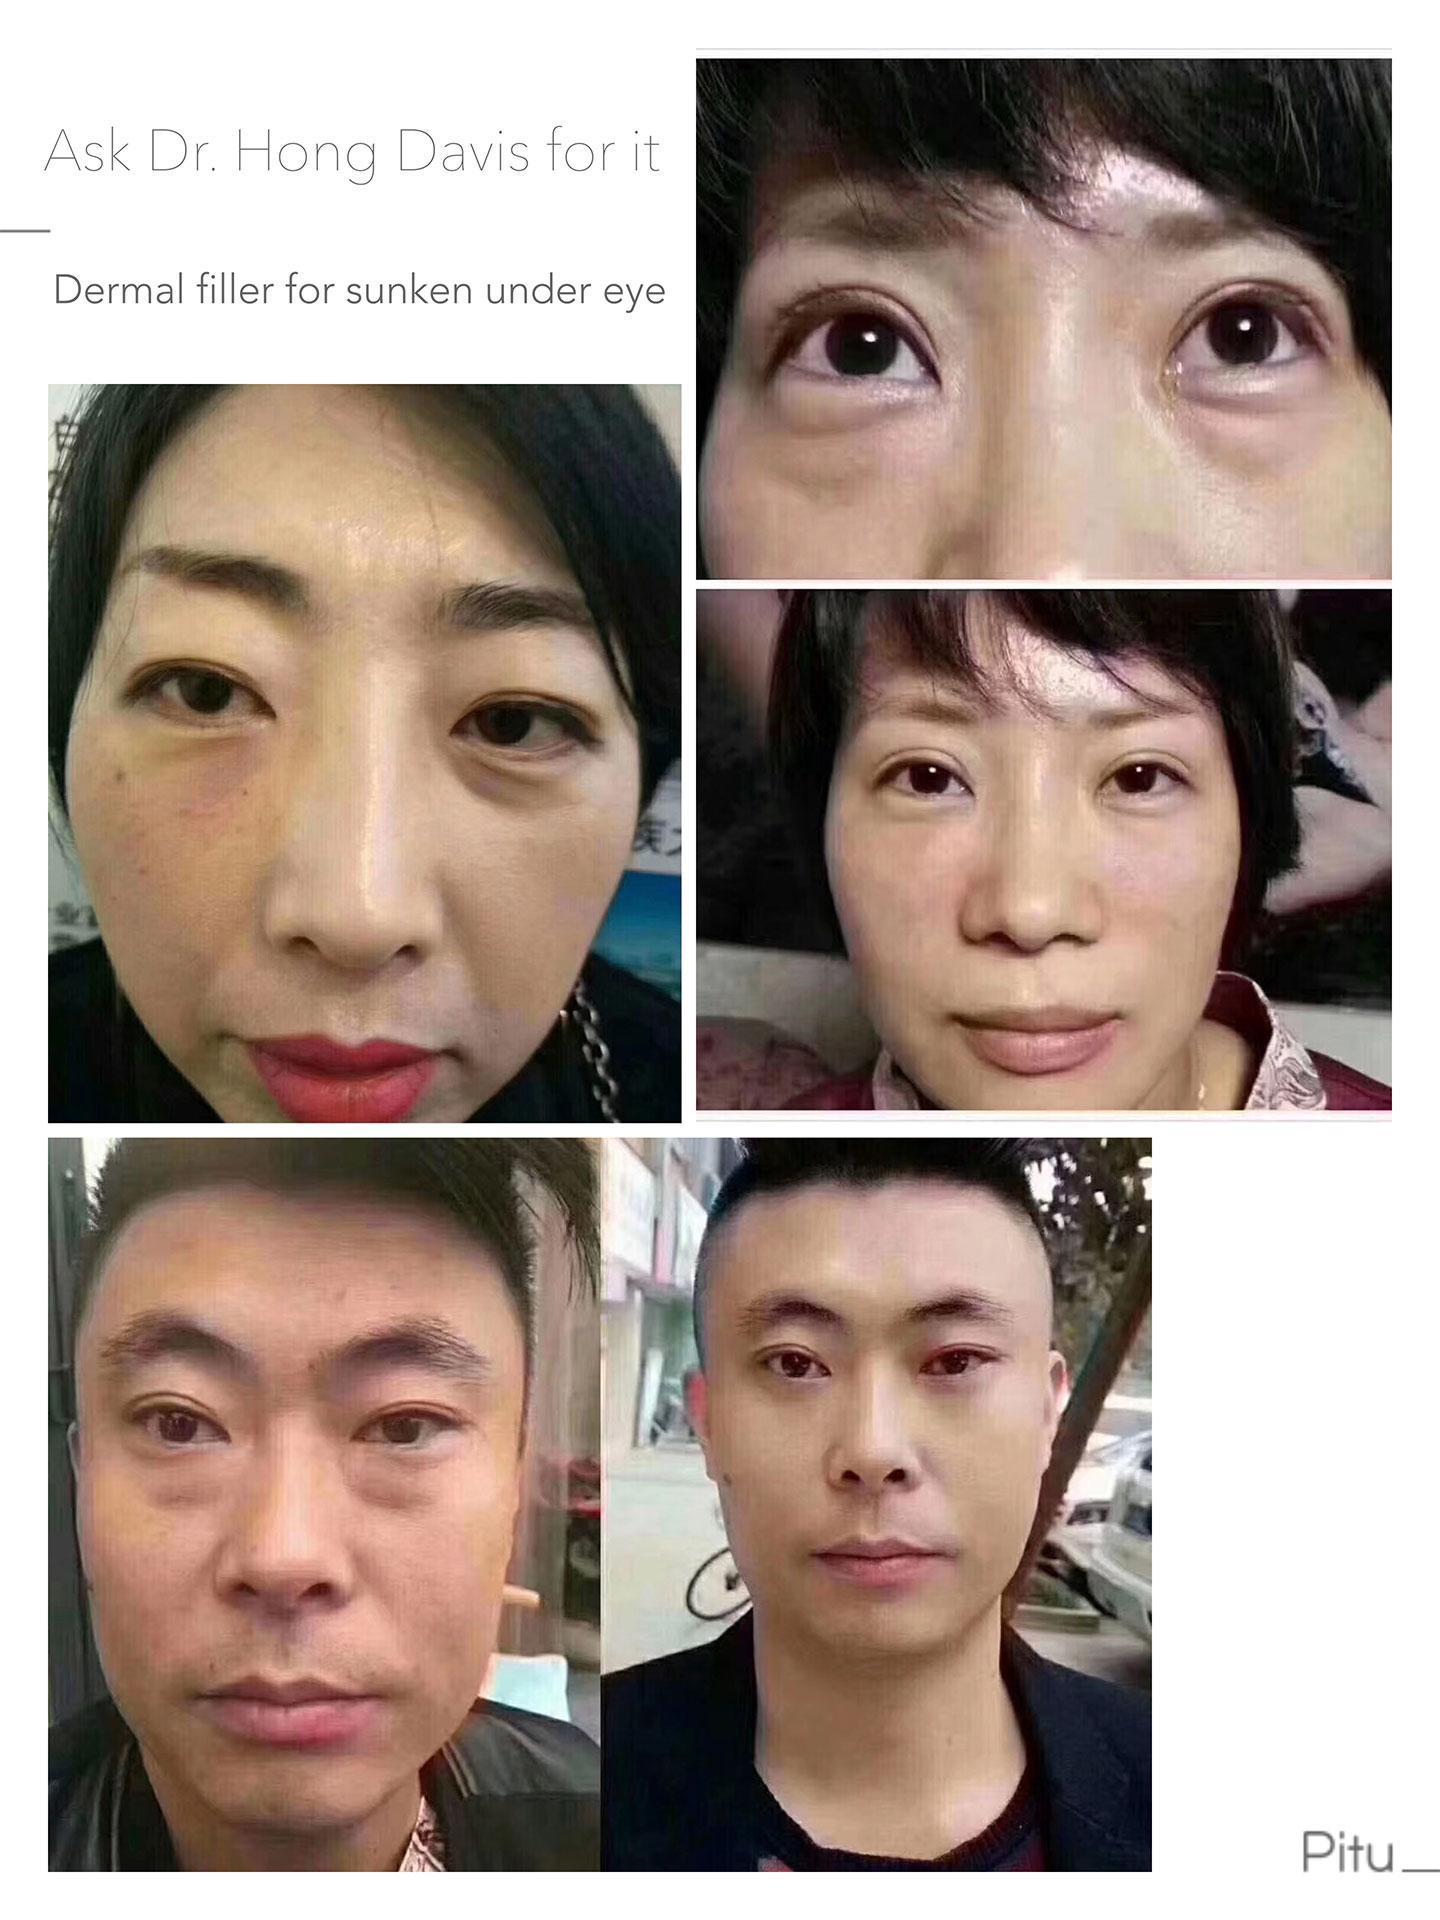 dermal filler for sunken under eye and middle face before and after